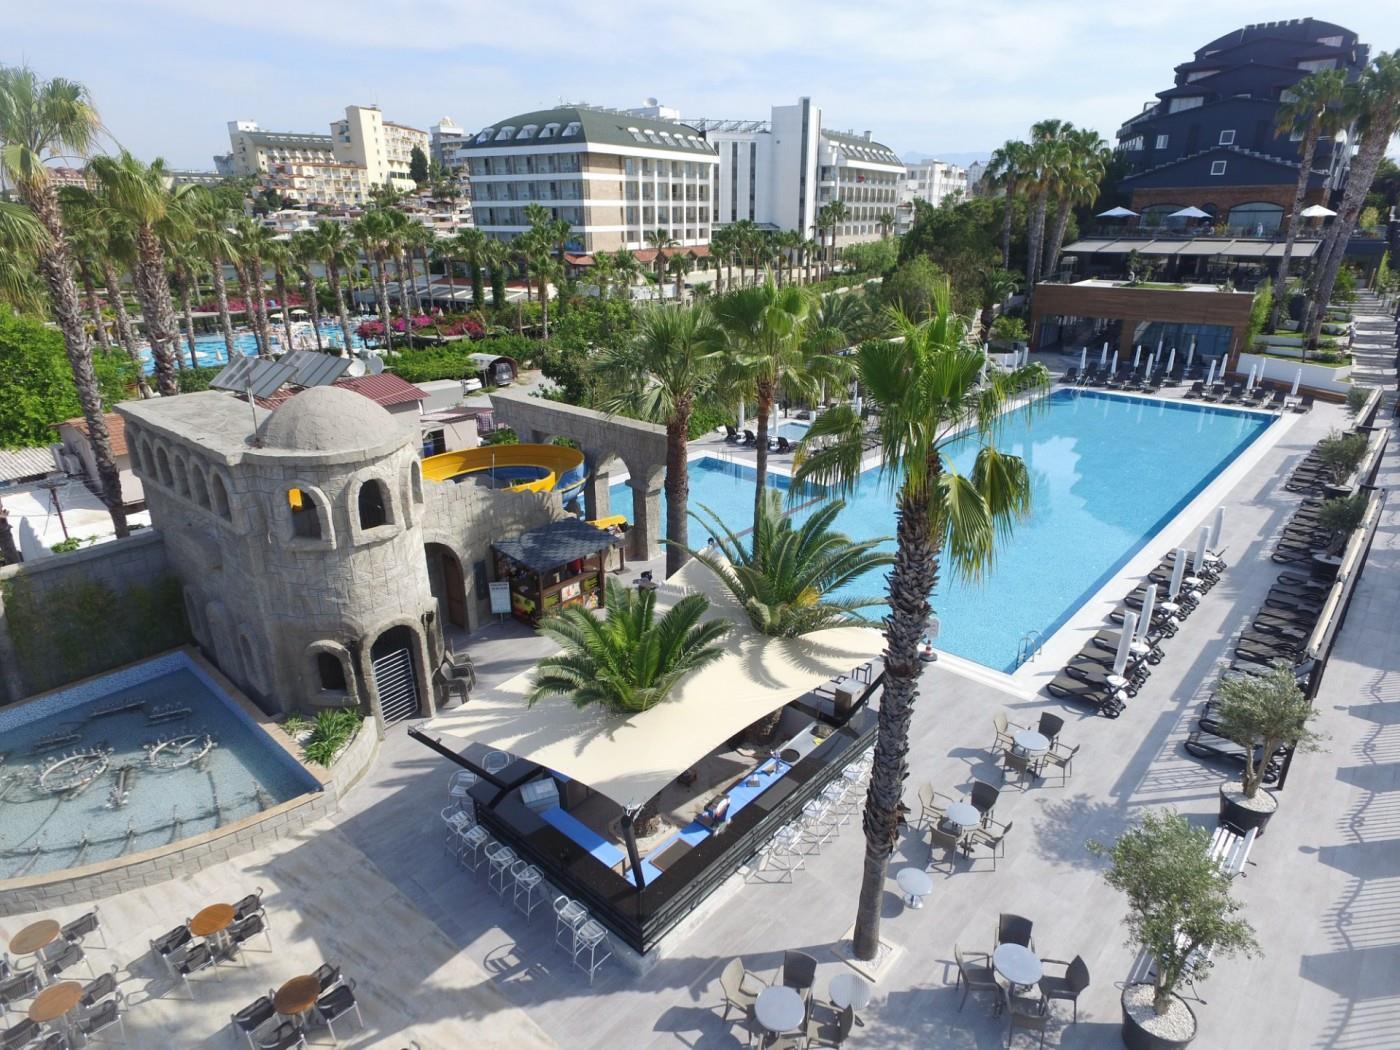 http://www.orextravel.sk/OREX/hotelphotos/thalia-unique-area-0014.jpg